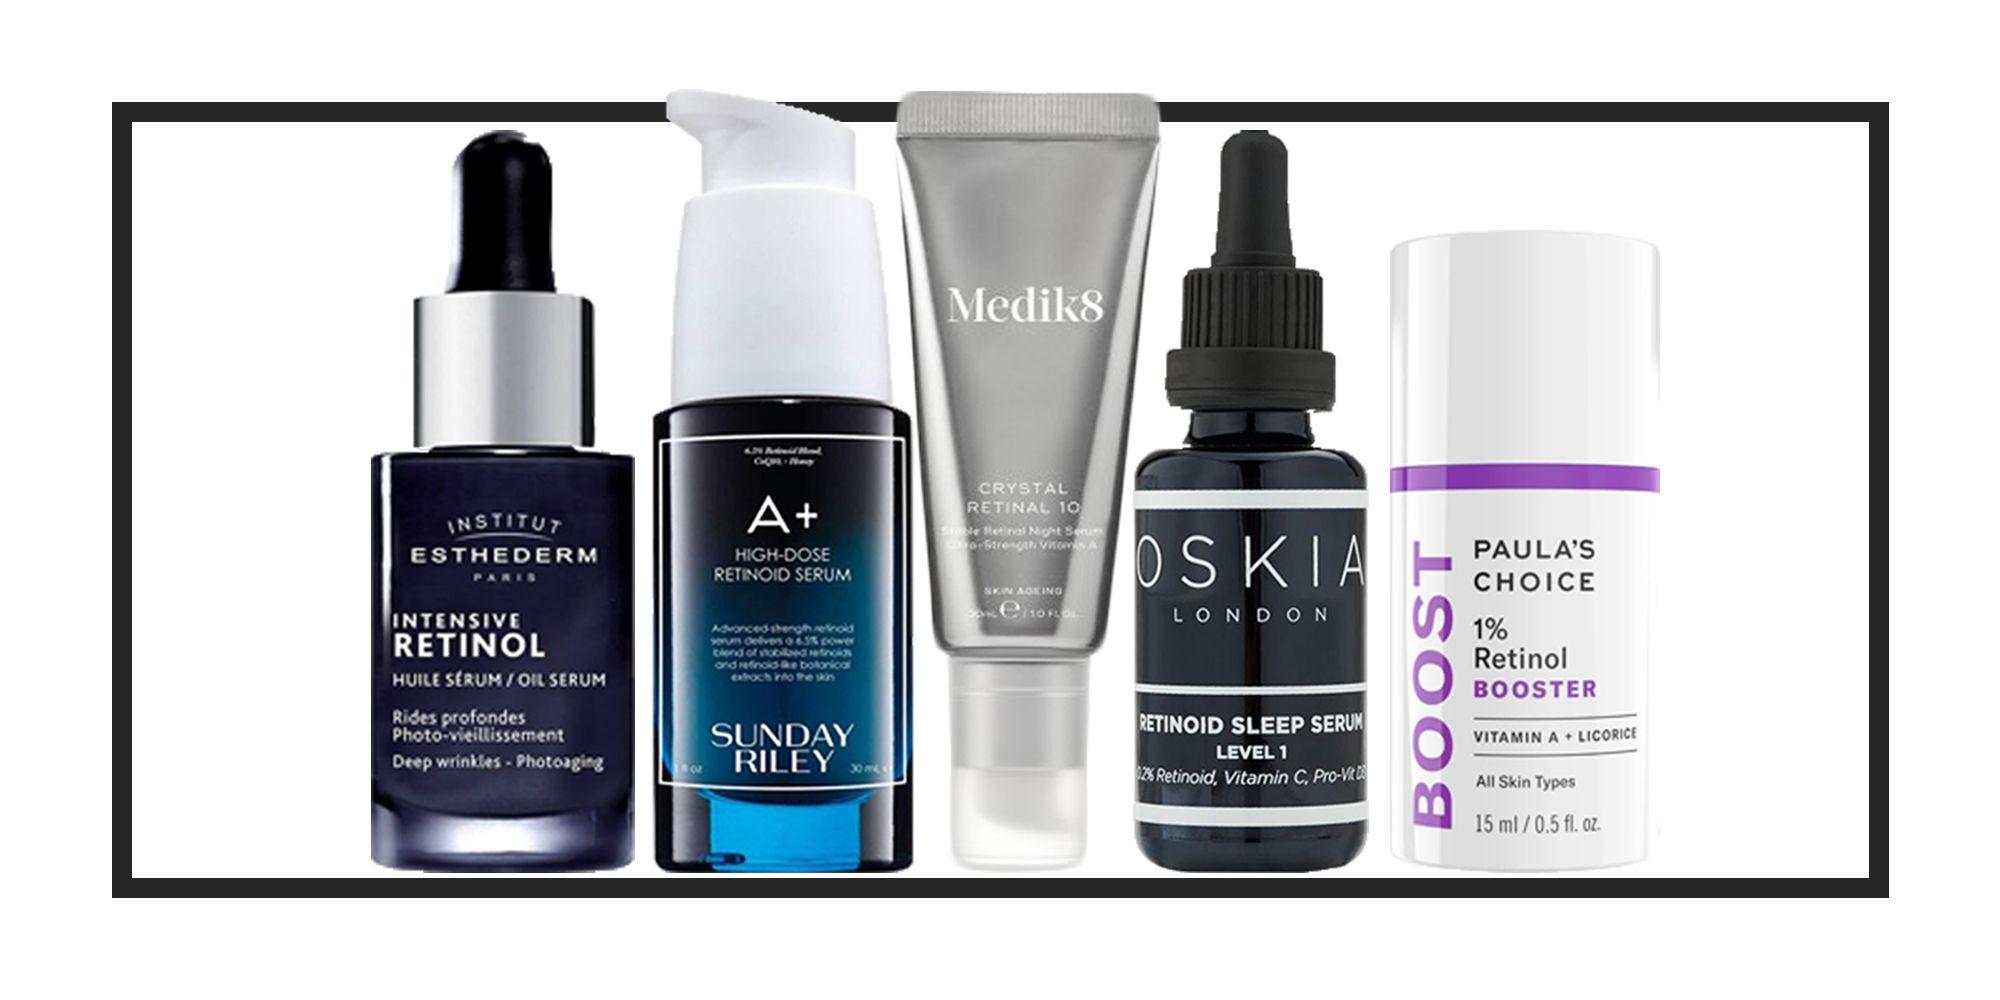 The 12 best retinol serums, creams and oils